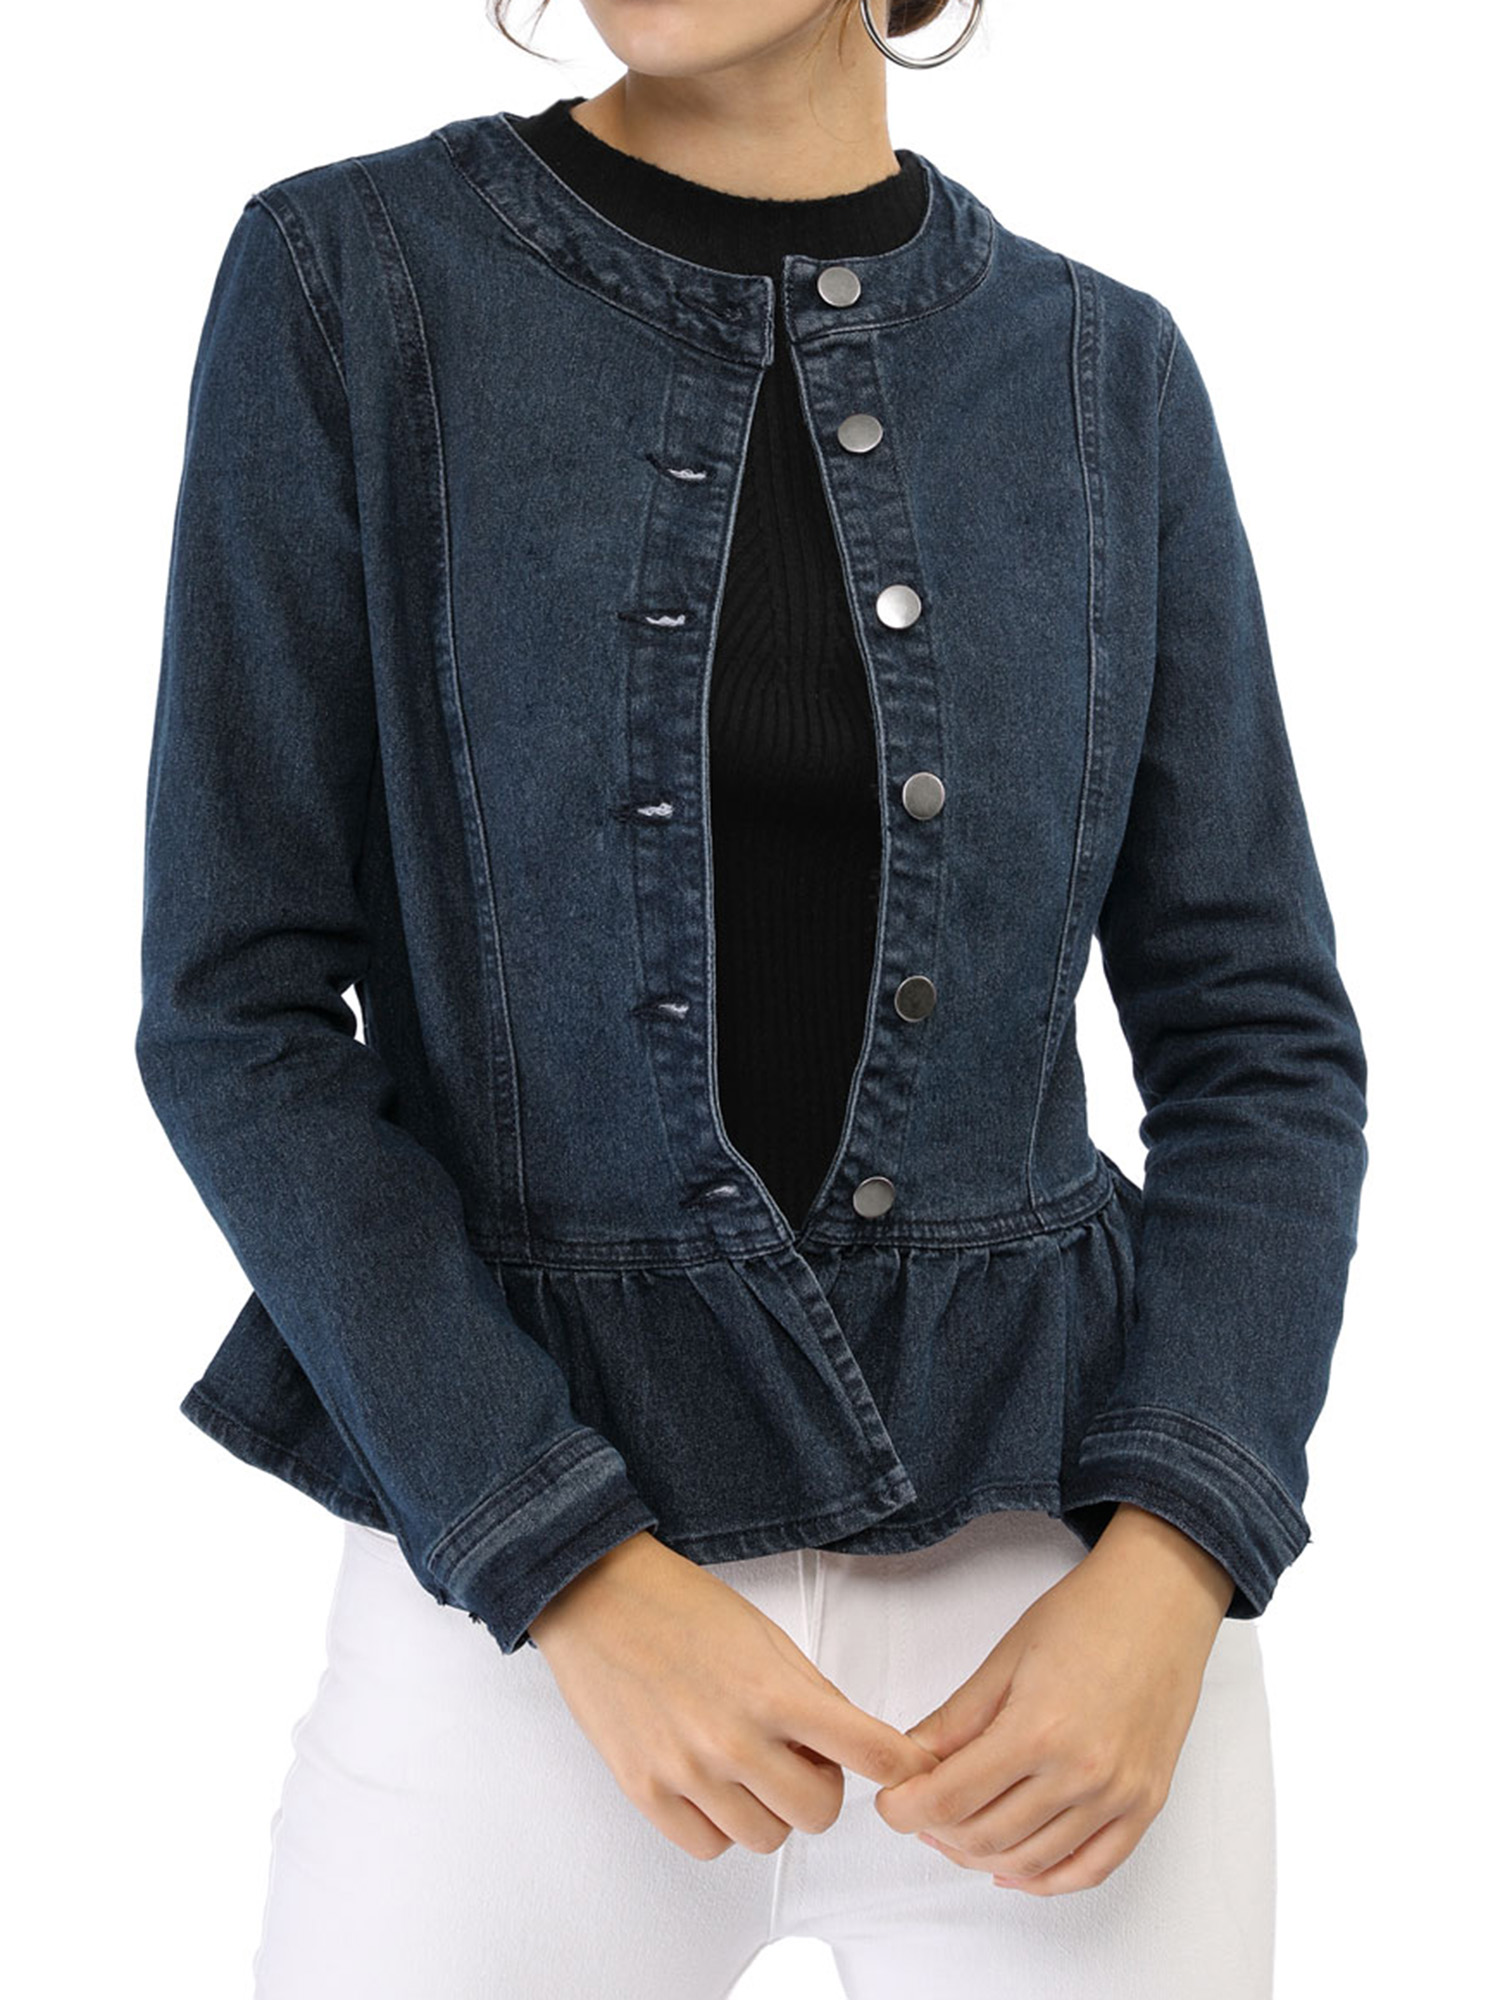 Baby Bobbin Neck Jacket